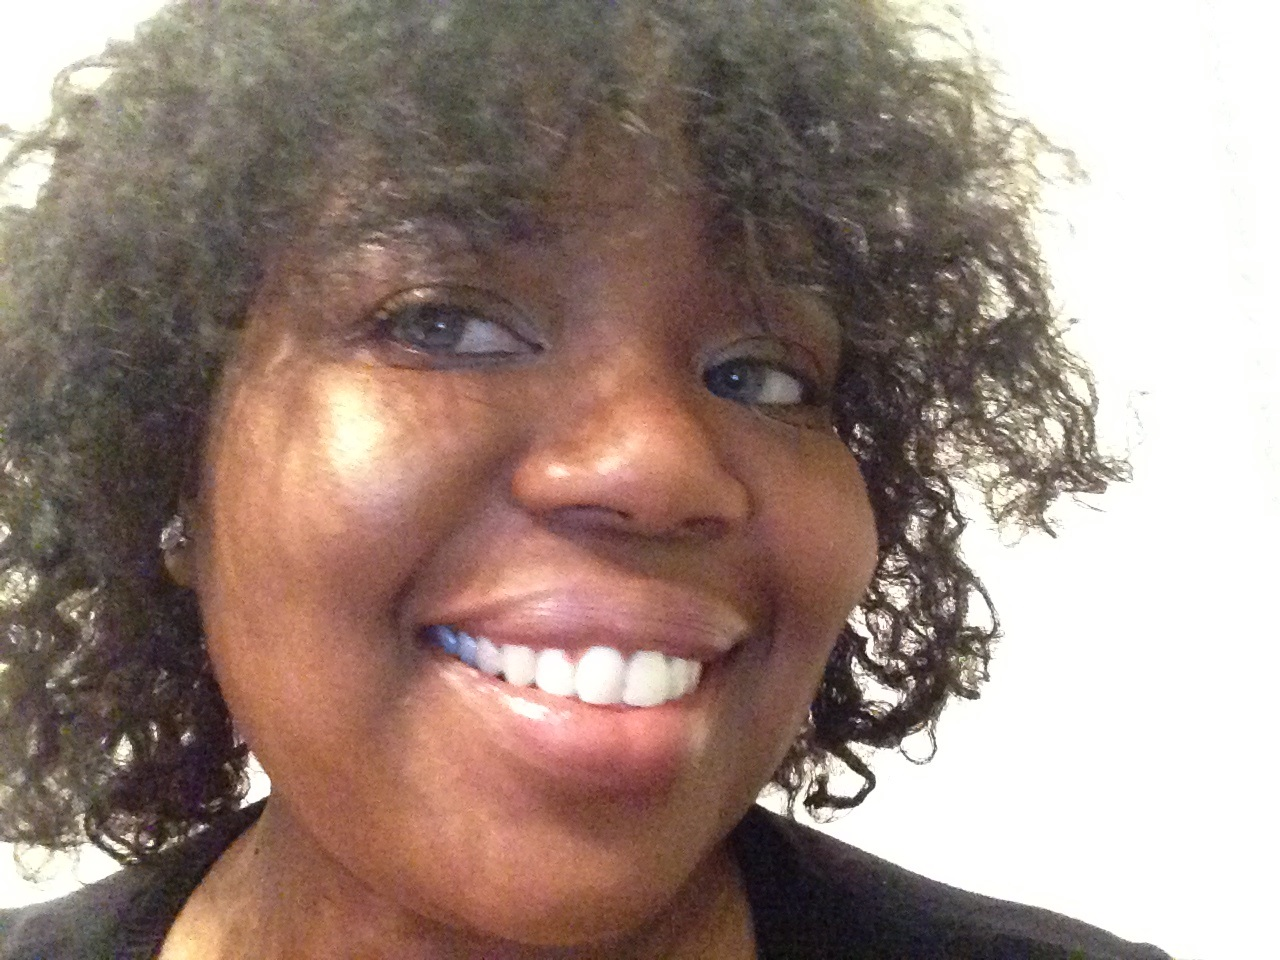 Dani Dixon Tumble Creek selfie 20 Questions